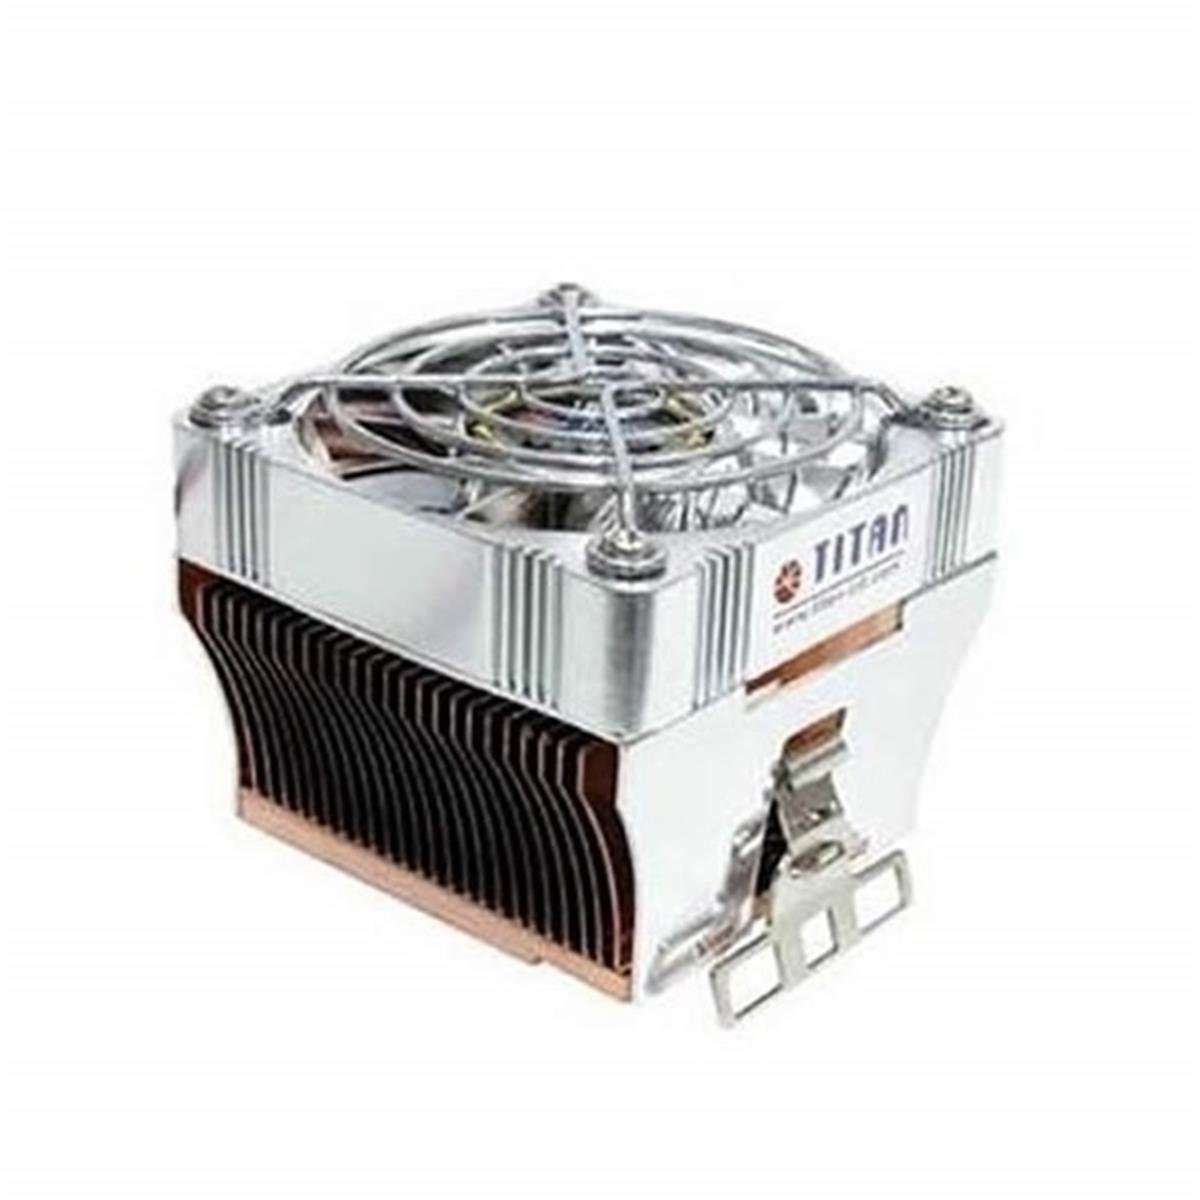 Cooler Para Cpu Athlon Xp Amd 462 Titan Ttc - Cu5tbf Evercool